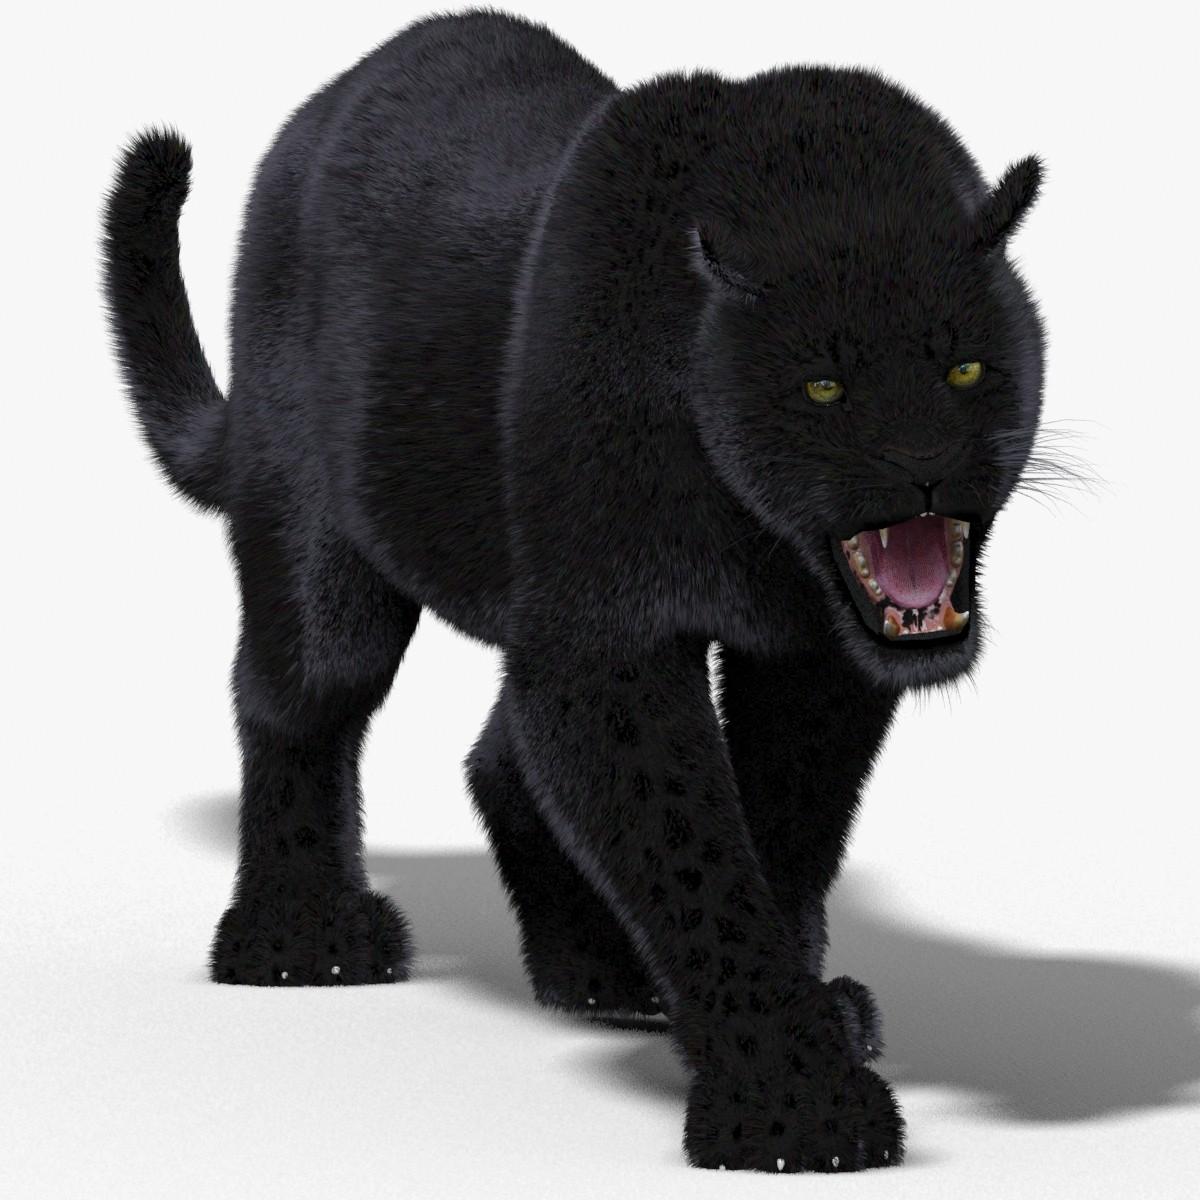 Panther-3D-model-animated-fur-00.jpg